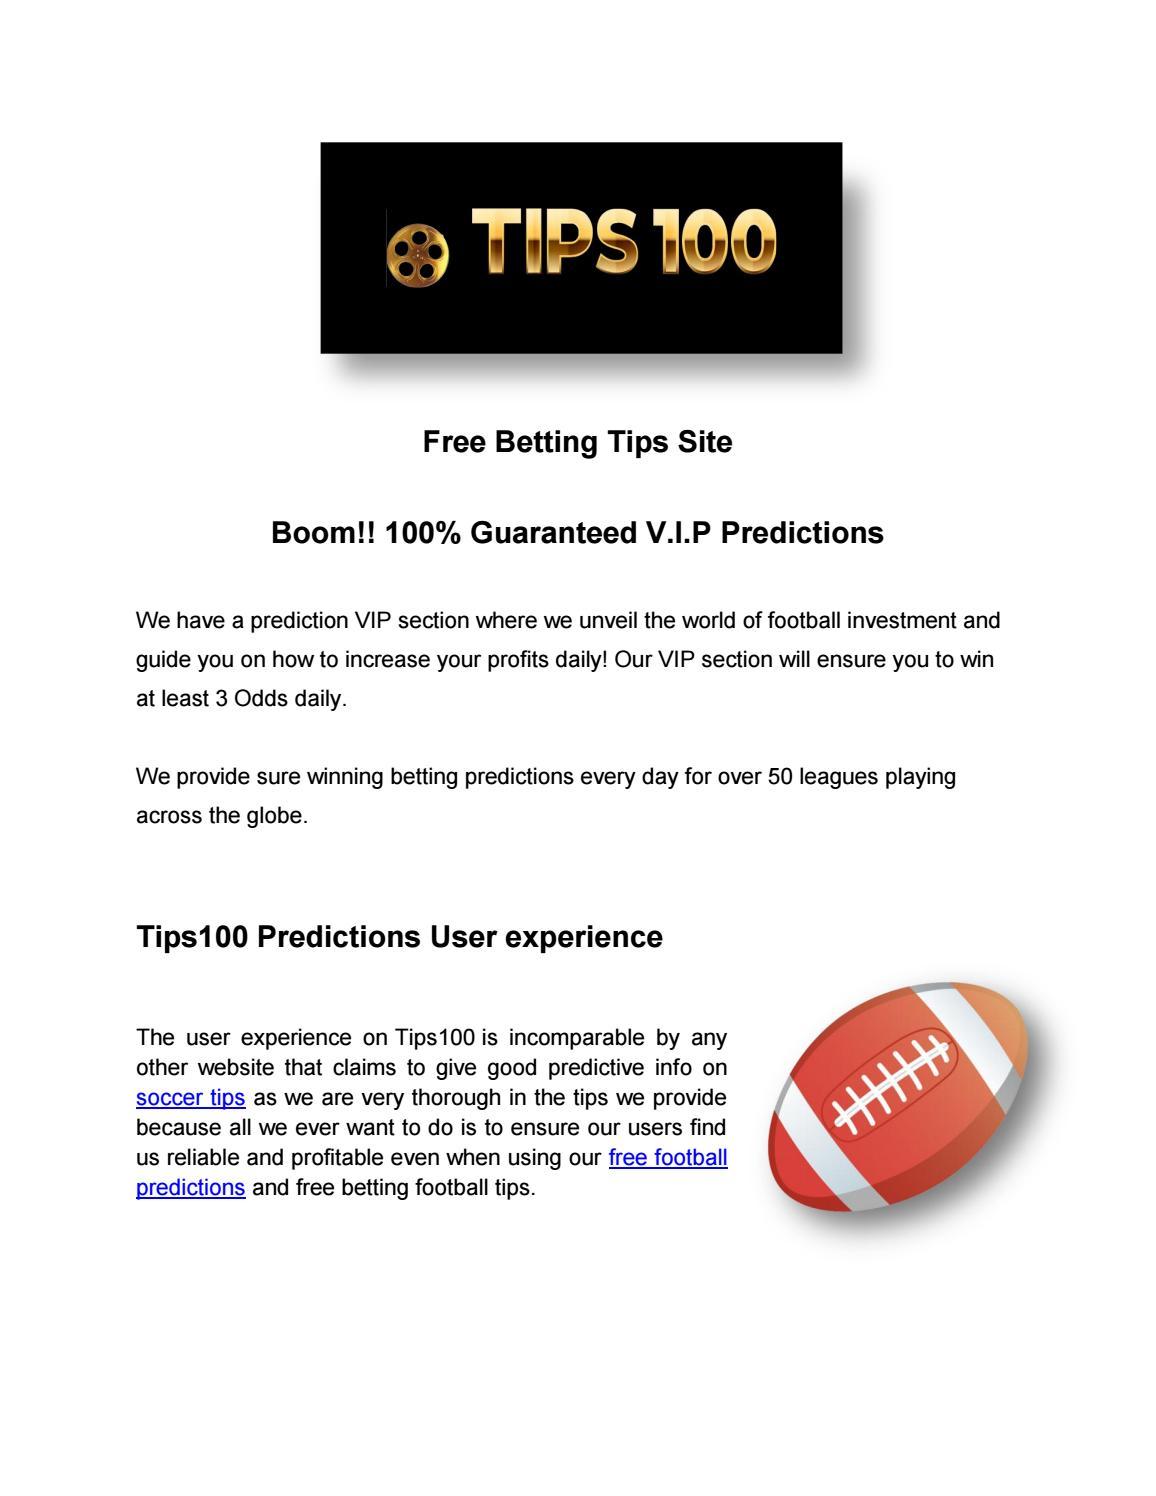 Betting sure win seahawks rams betting predictions csgo